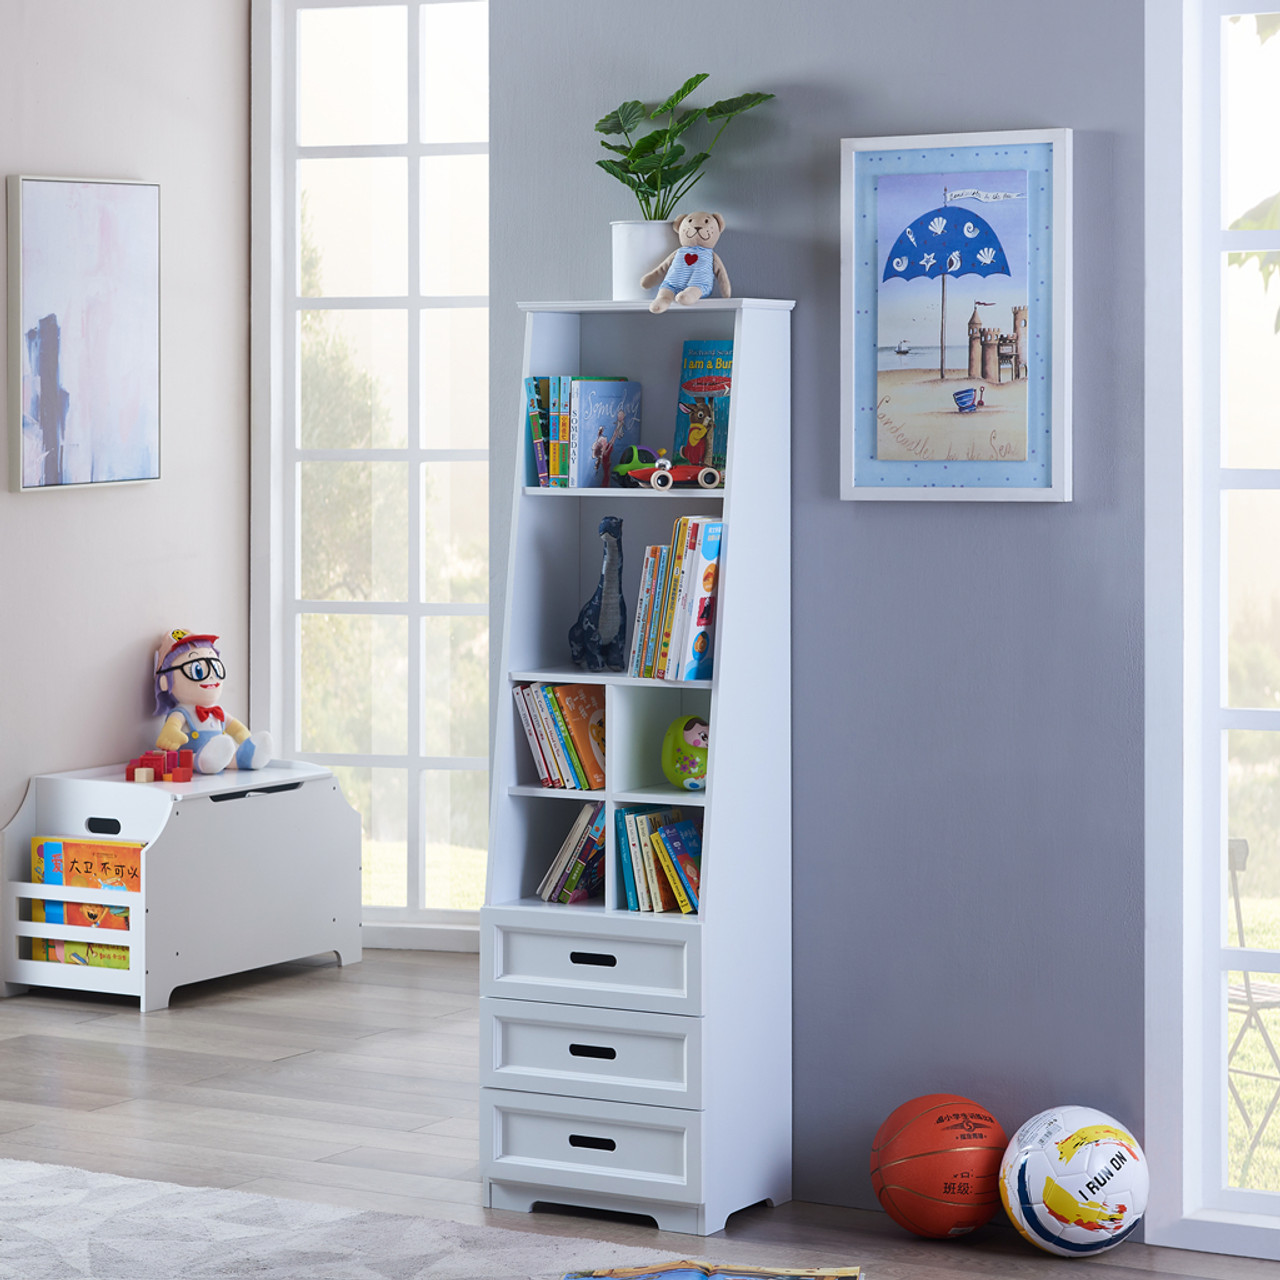 All 4 Kids Candice White Bookcase Book Shelf Storage Unit Joy Baby